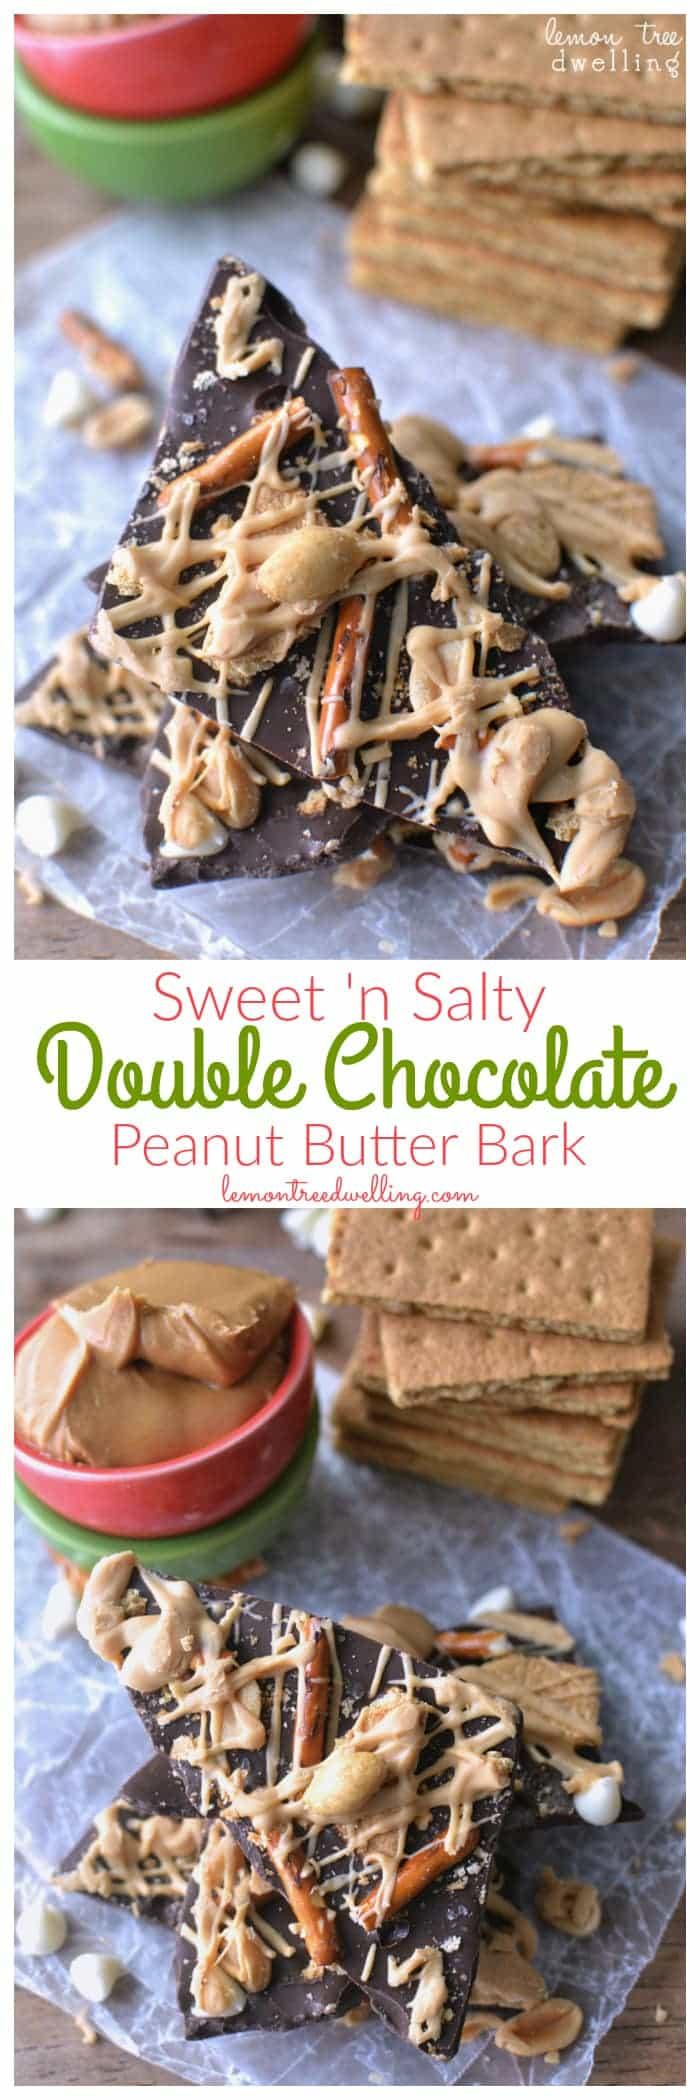 Sweet & Salty Double Chocolate Peanut Butter Bark